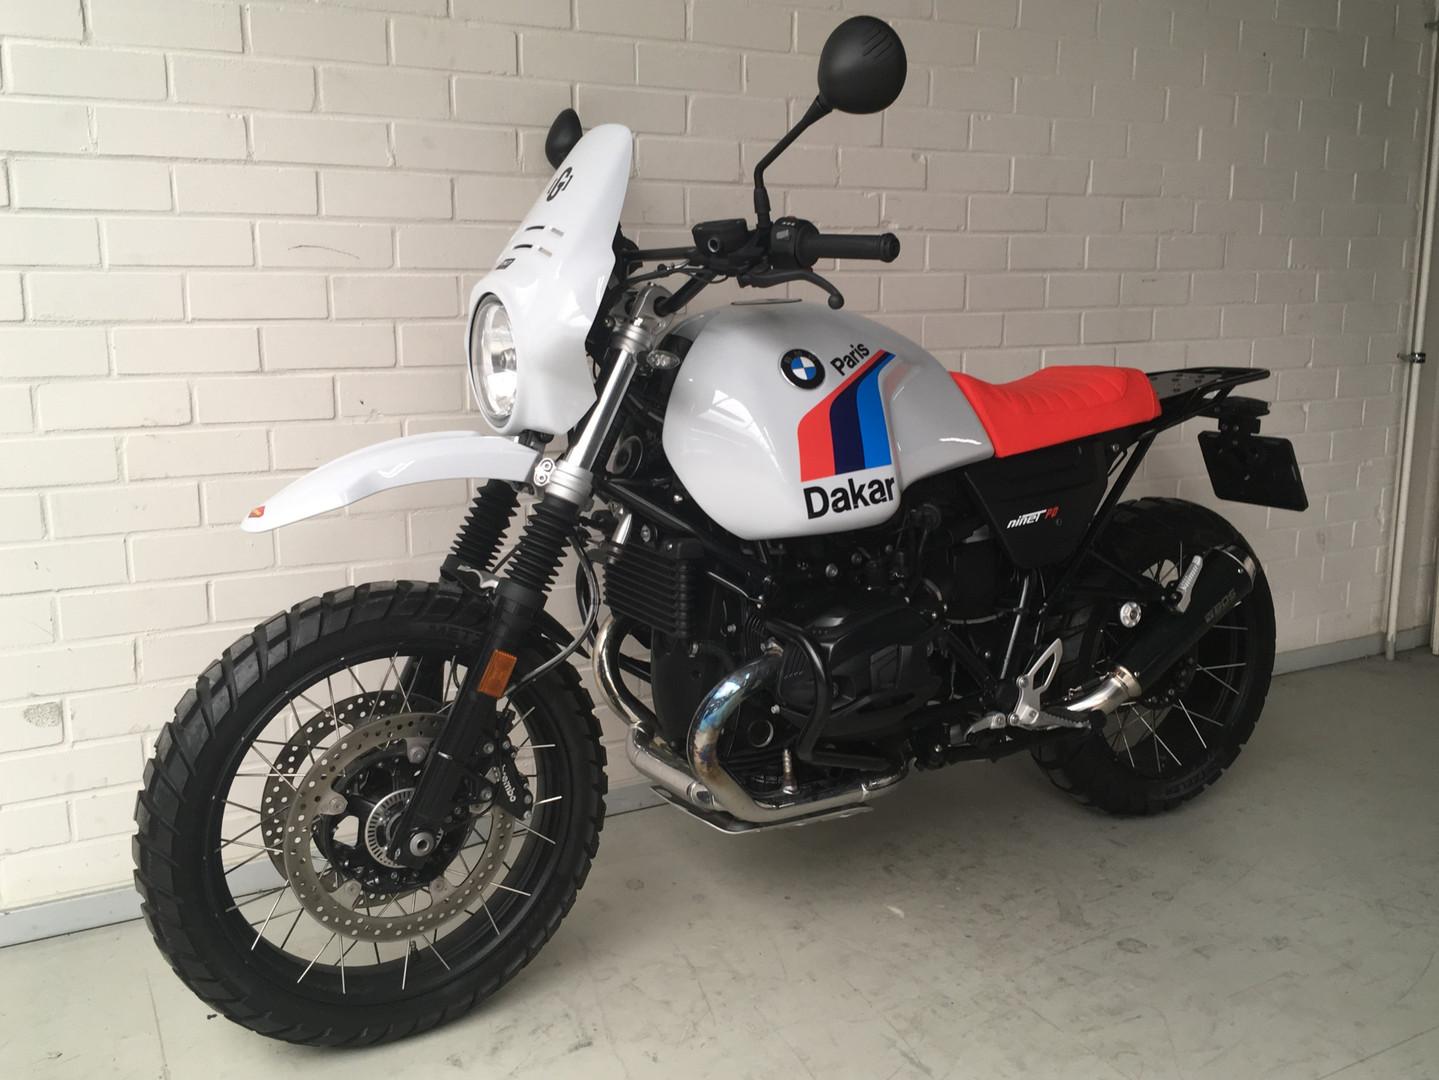 Gusto Motorbikes_BMW RnineT Urban G/S Paris Dakar